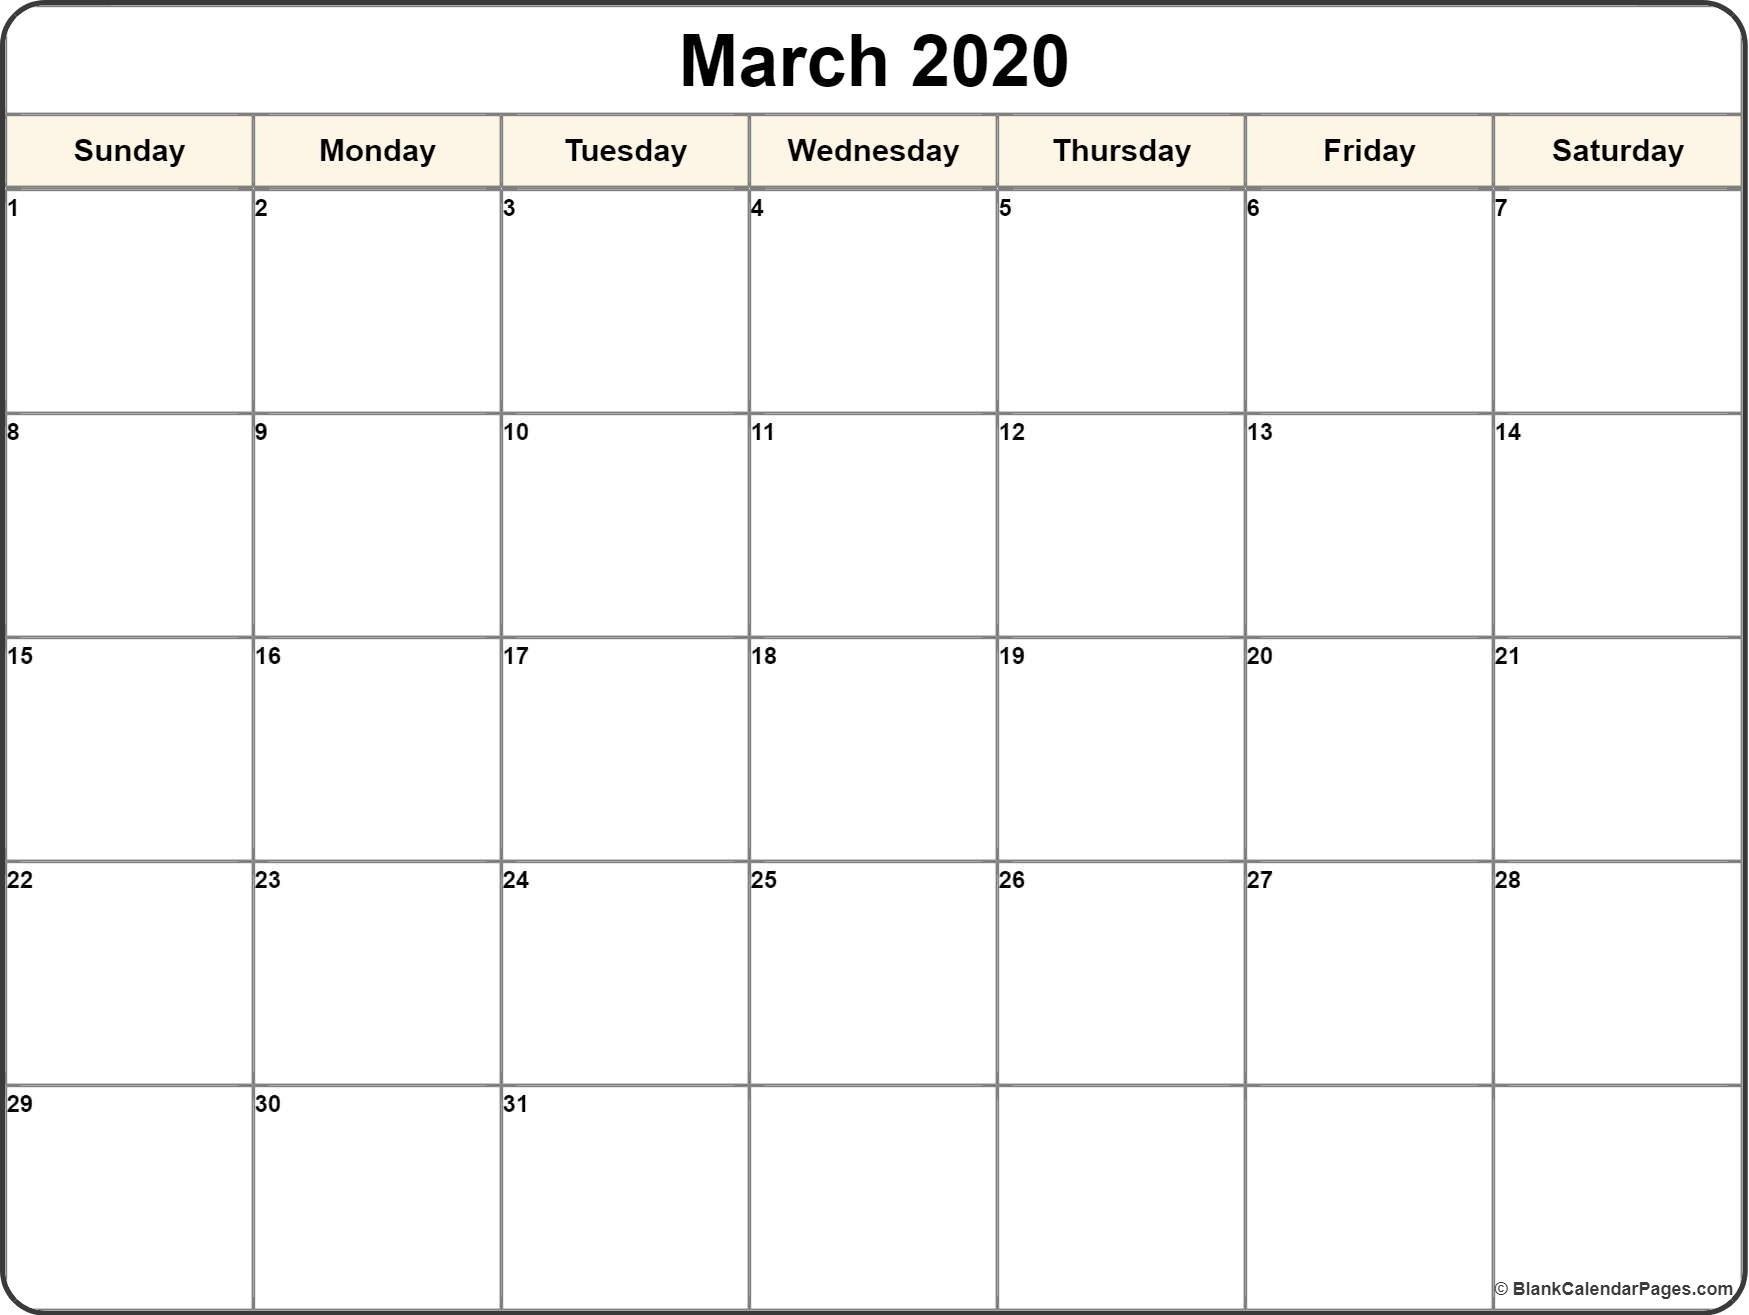 Calendar Template 2020 | One Page Calendar Printable  Full Page Monthly Calendar Printable 2020